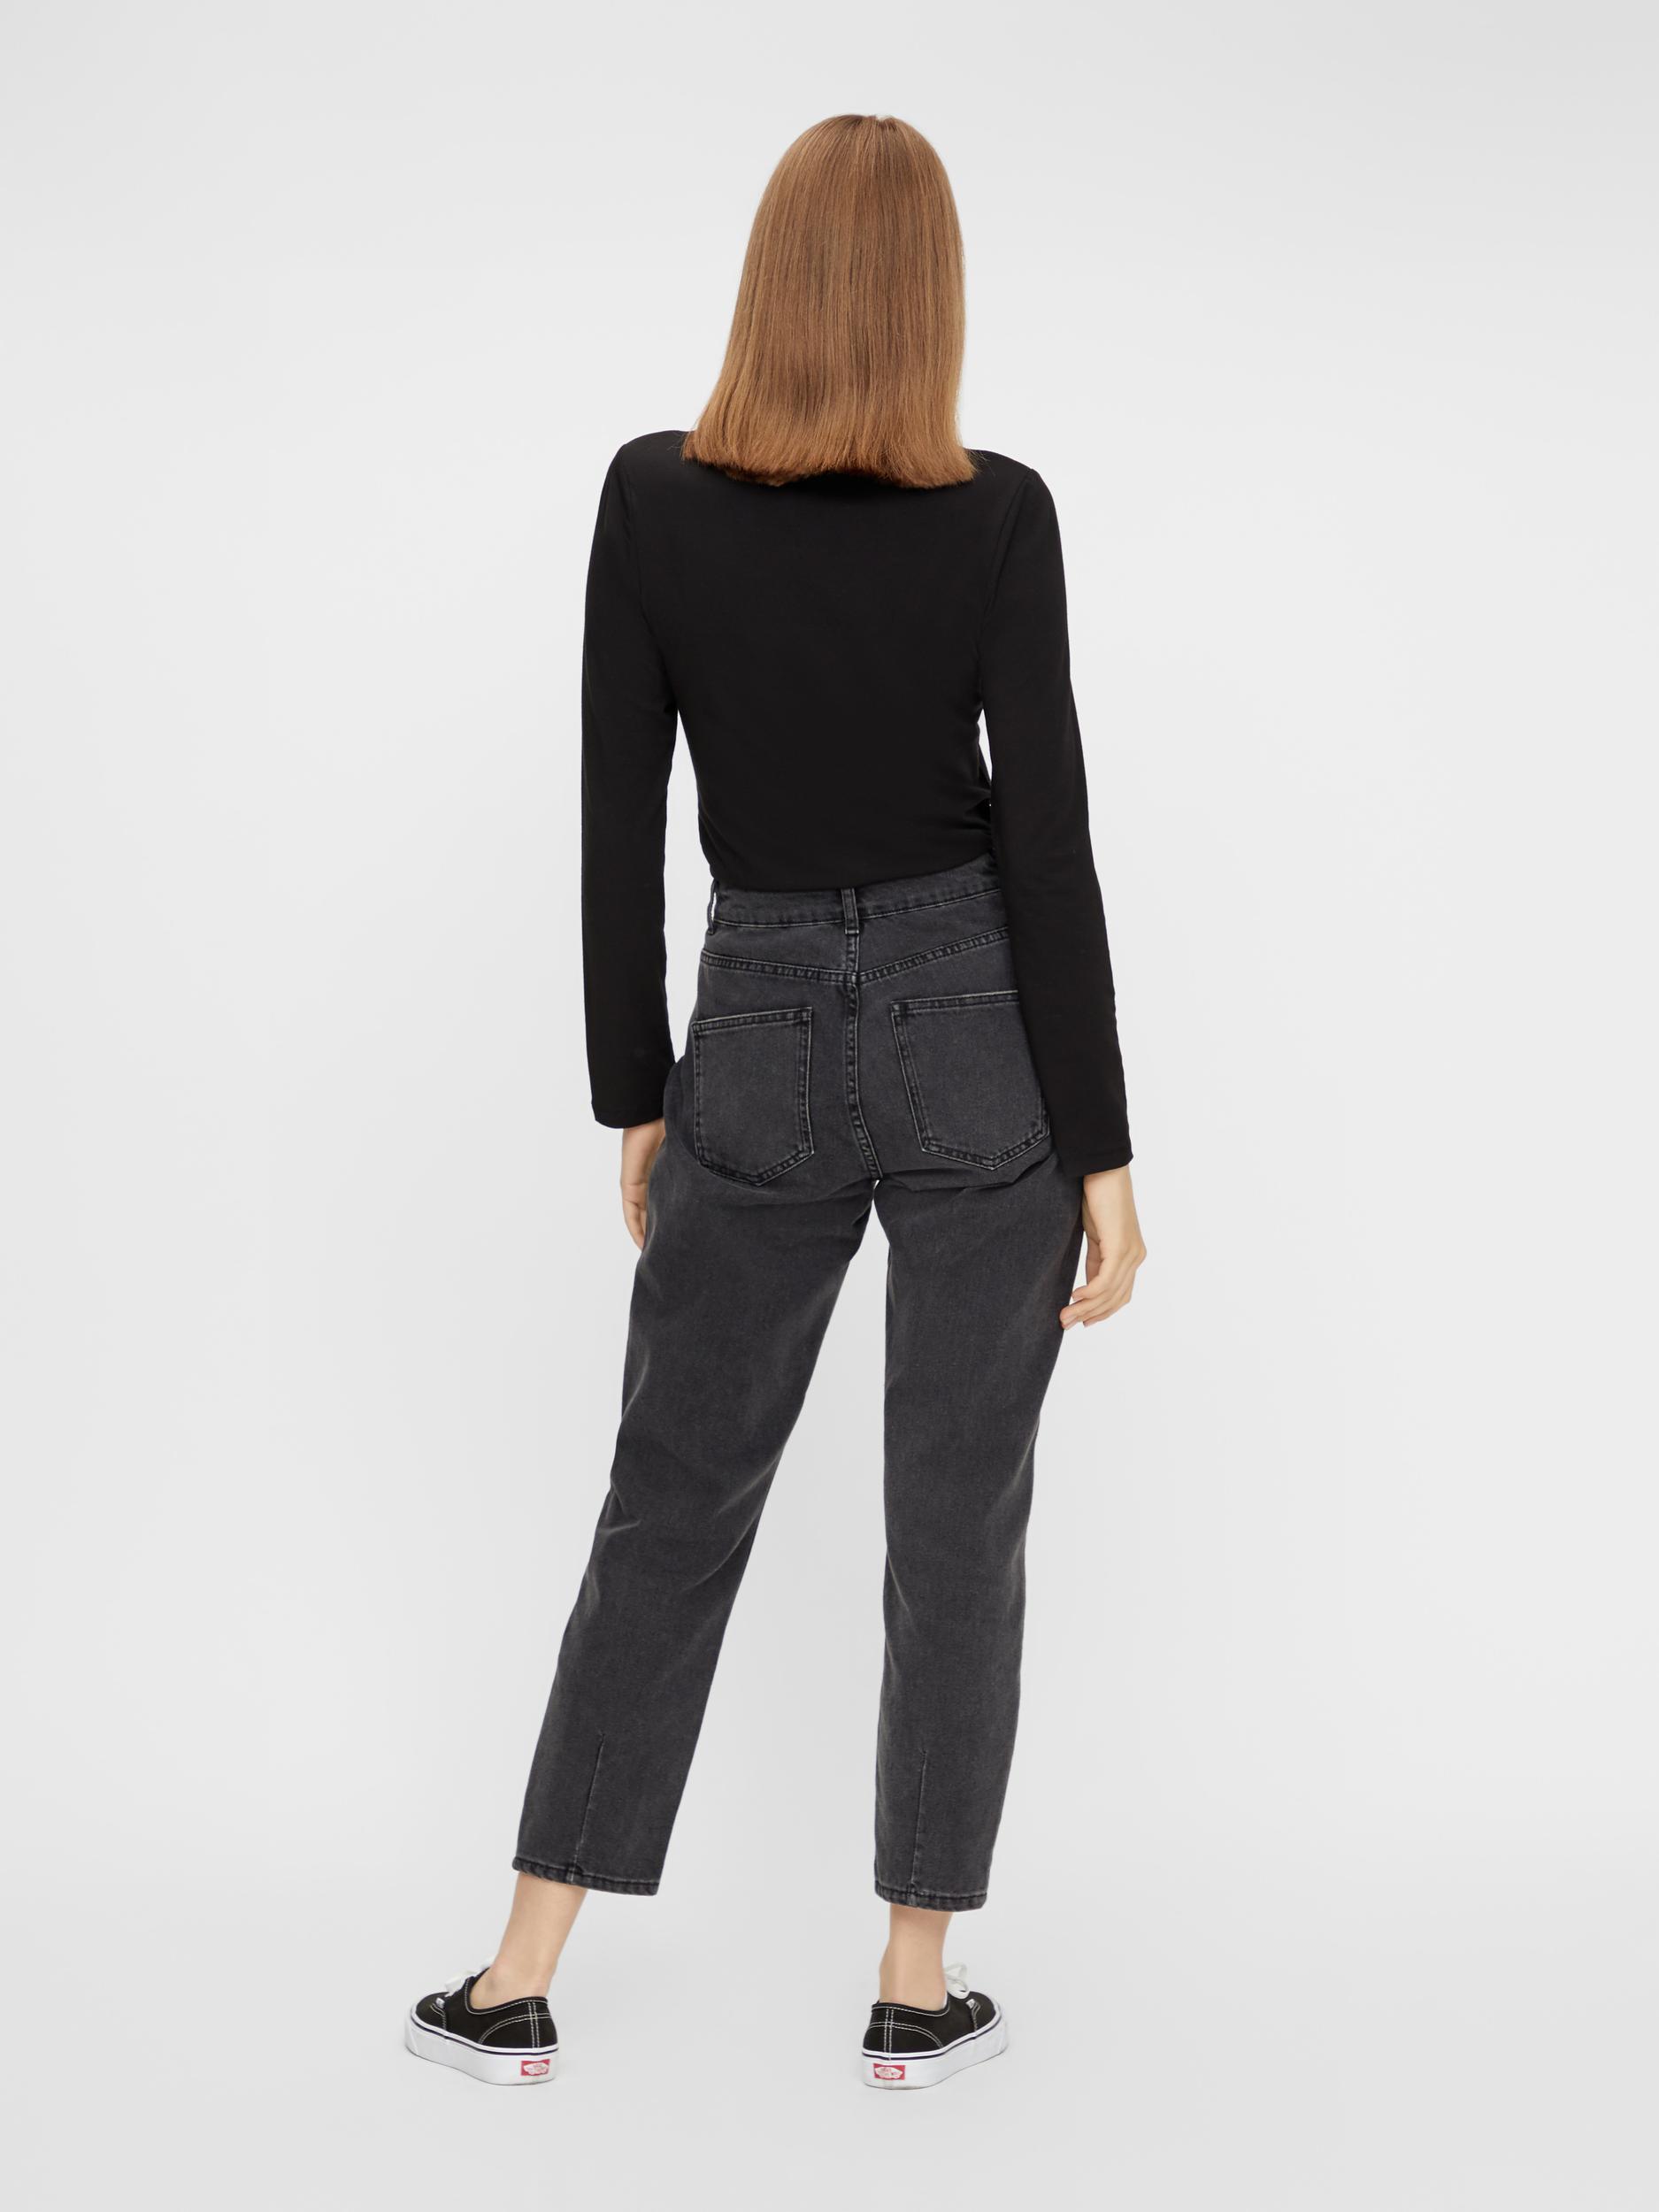 Fekete alap póló darab Sirene